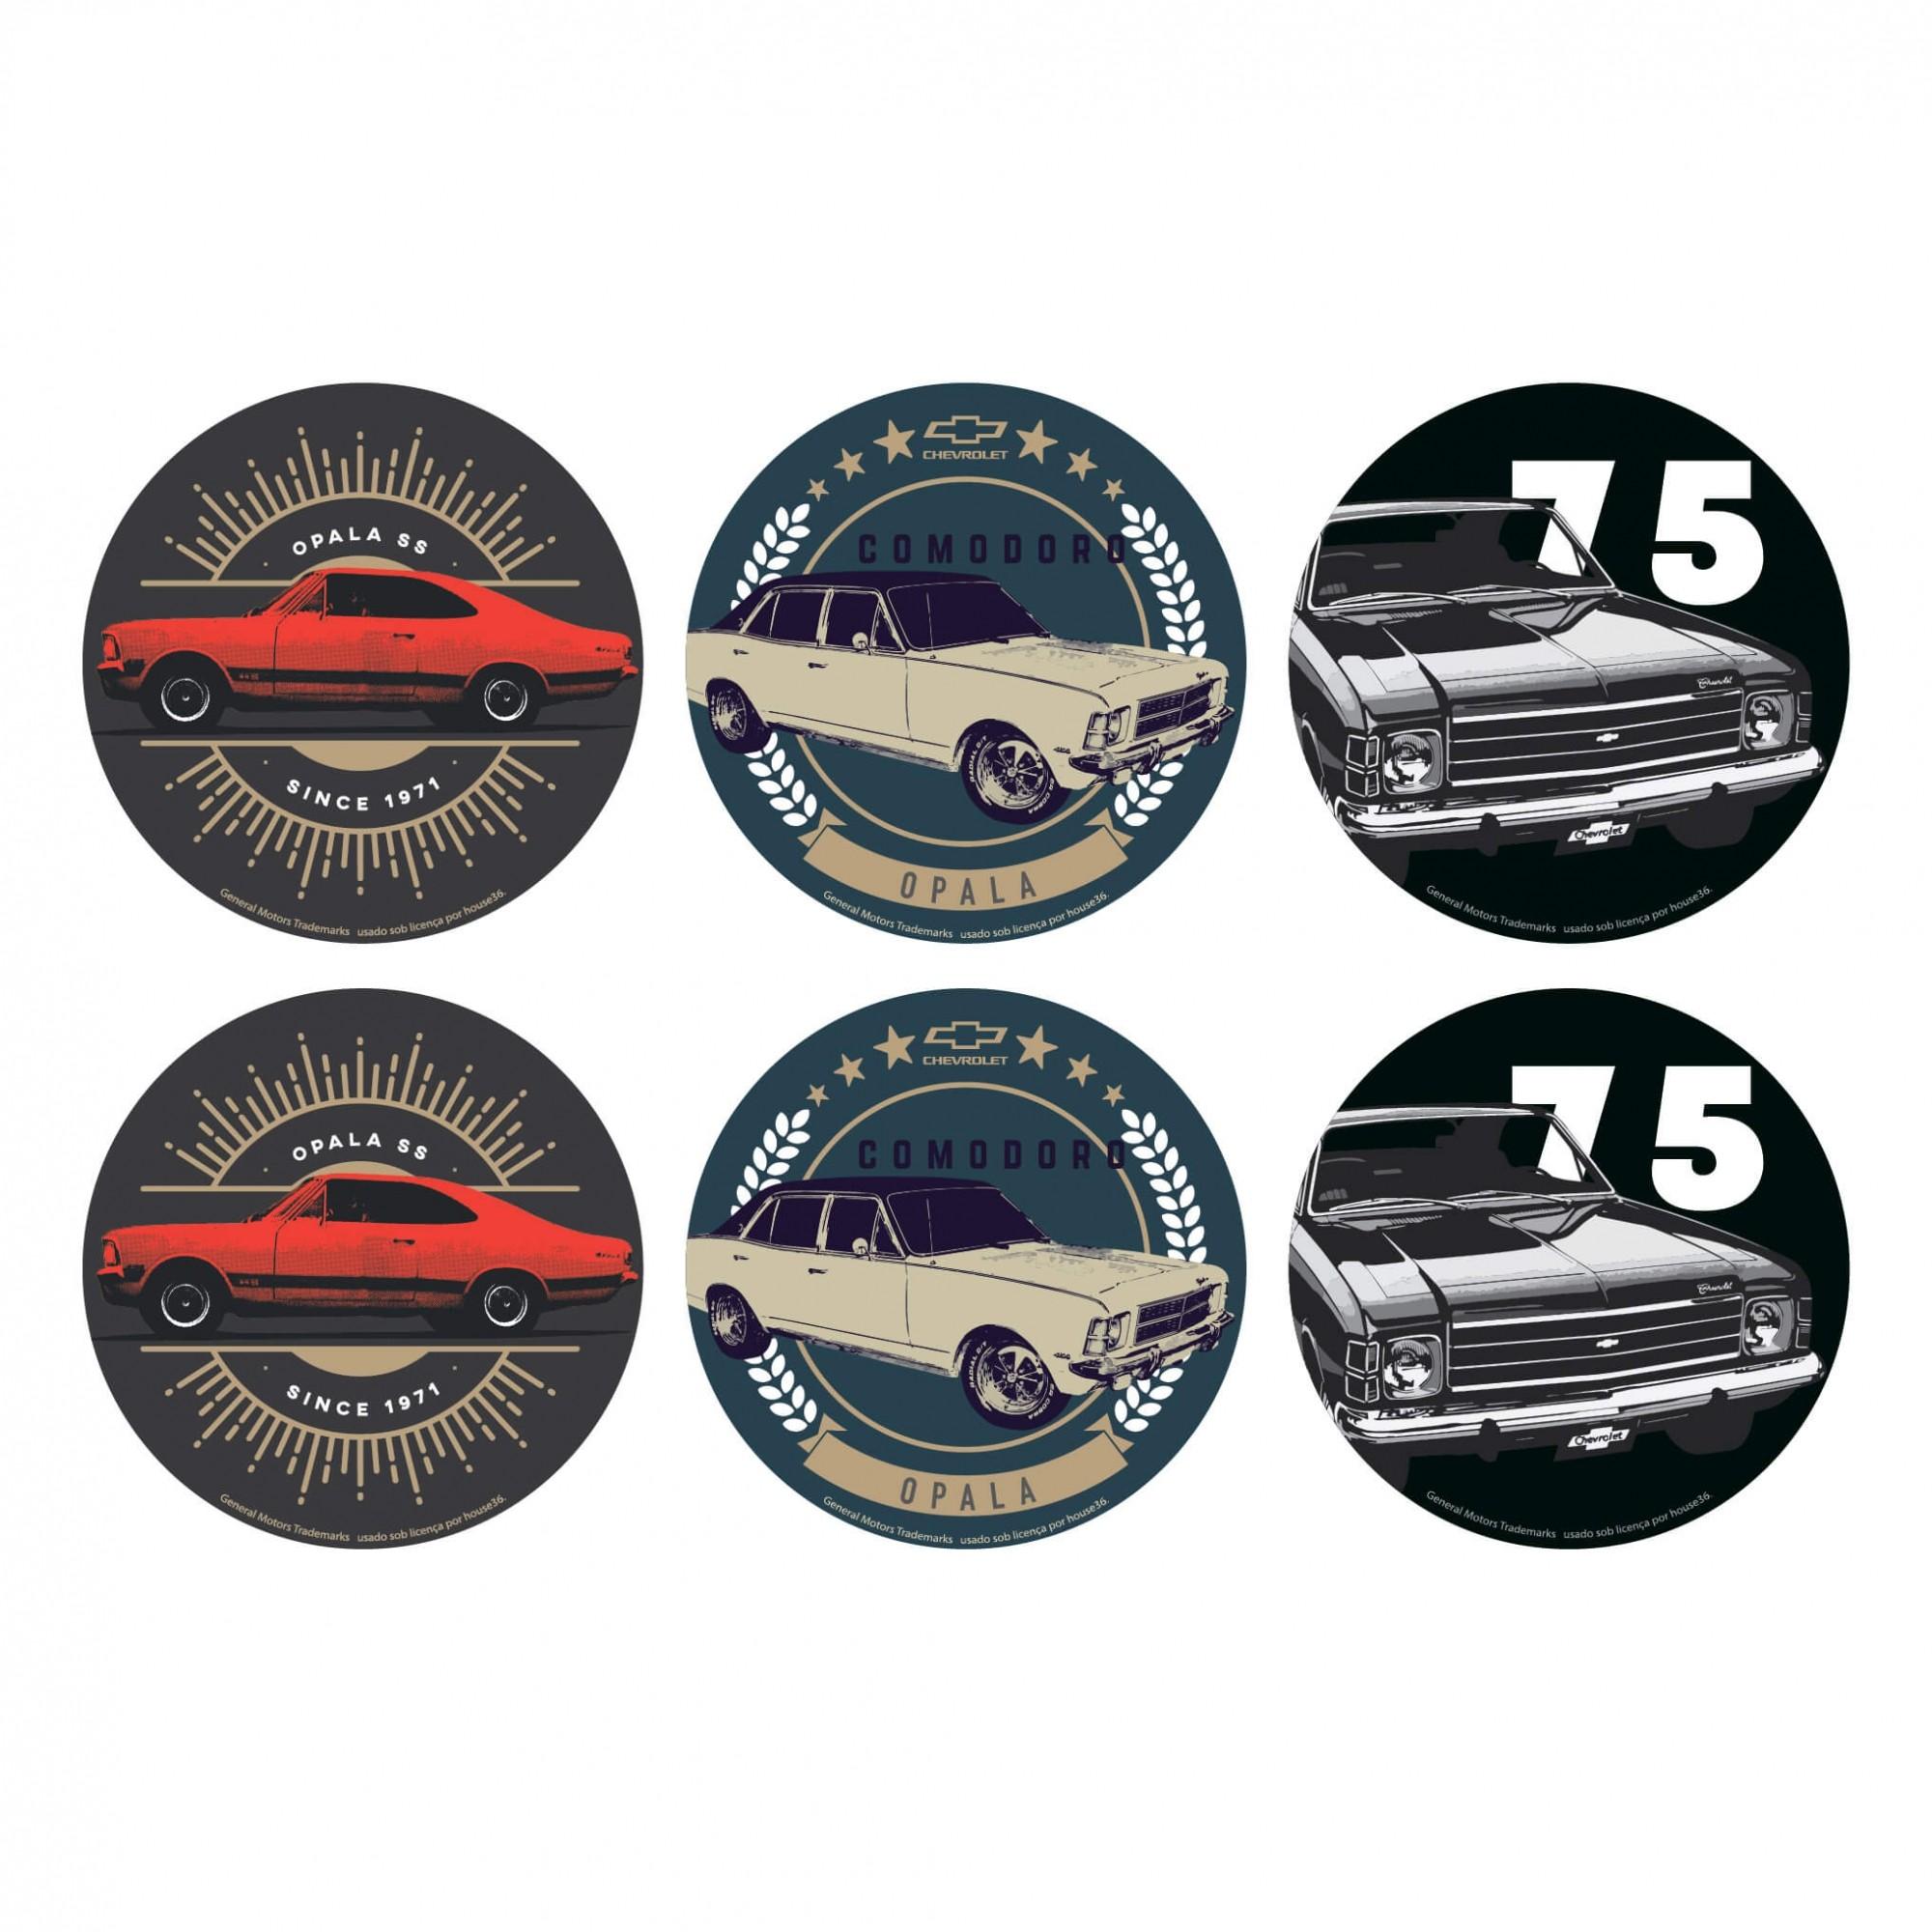 Jogo de Porta Copos Sortidos de Cortiça Chevrolet - Opalas